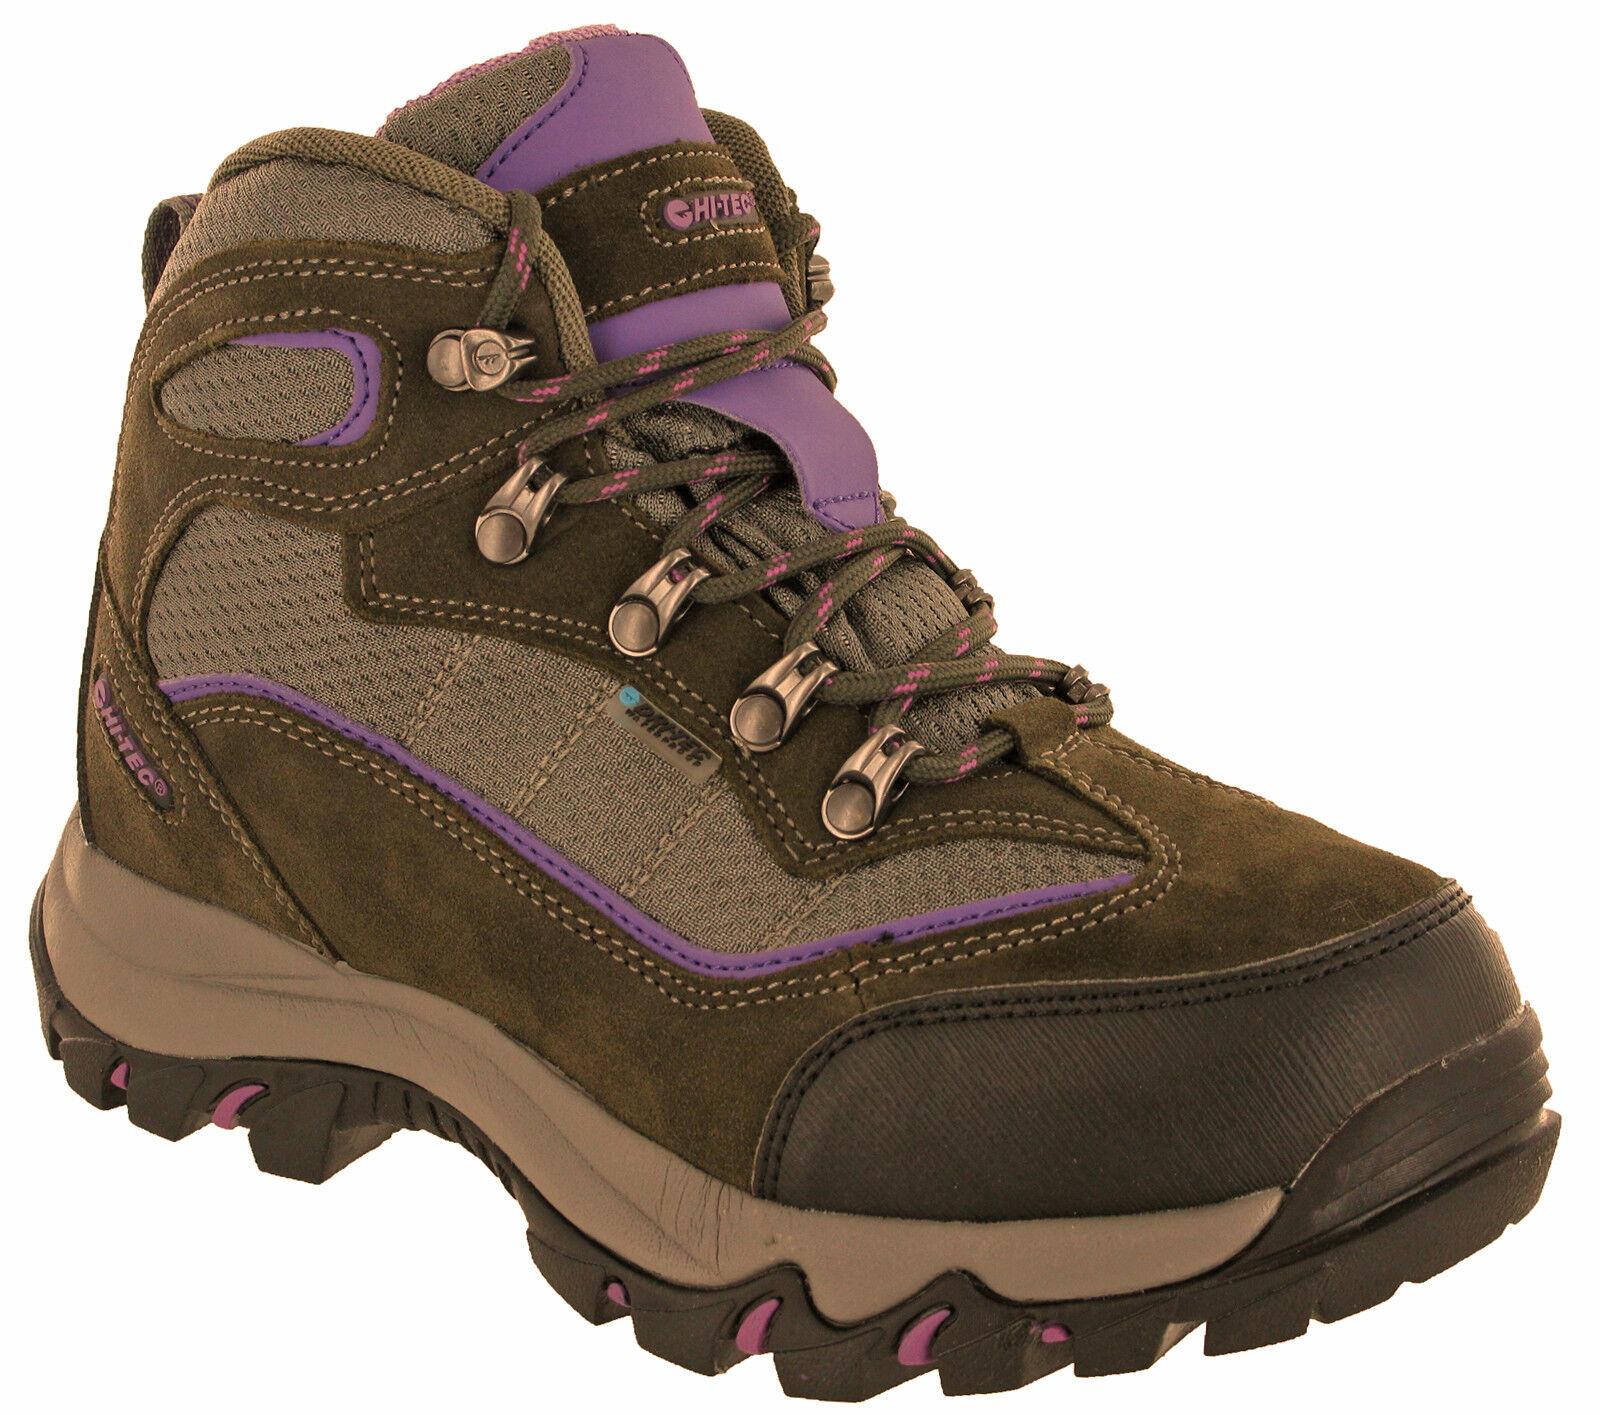 Hi-Tec Womens Walking Boots Waterproof Skamania Leather Hiking Trail Lace